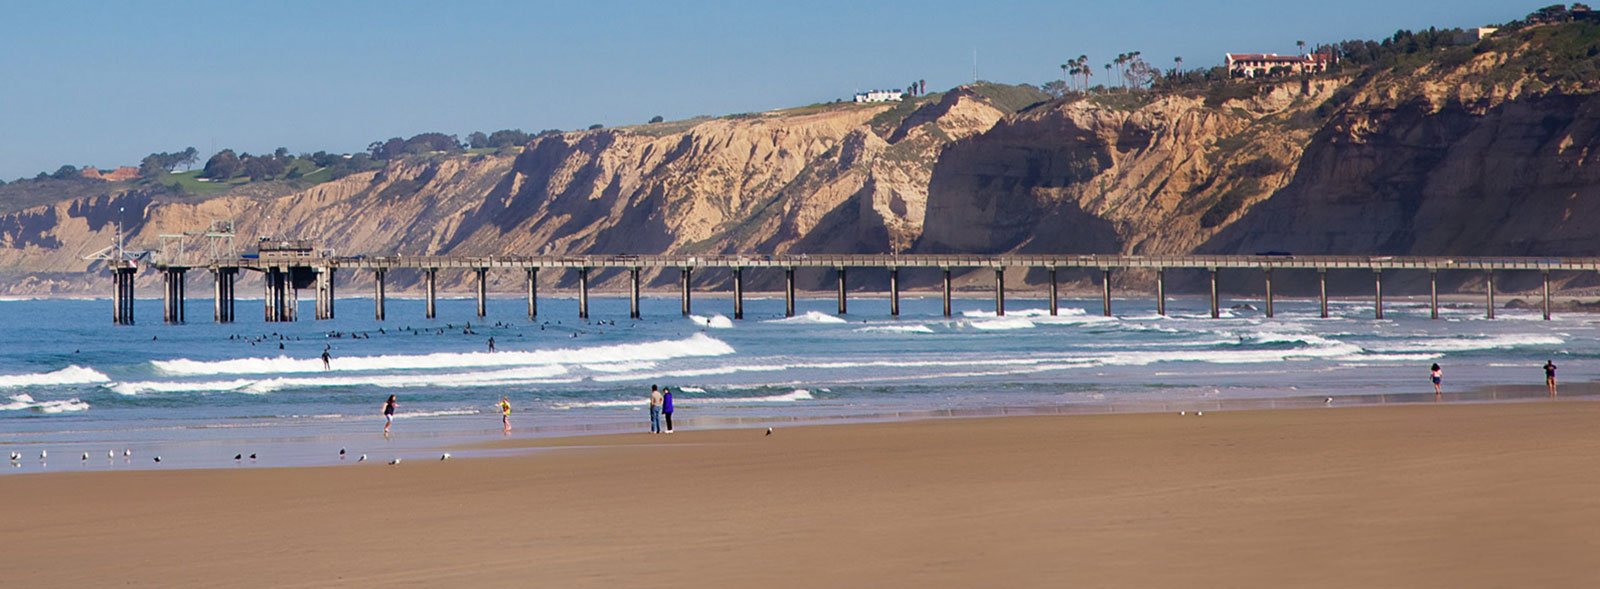 Location of La Jolla Shores Hotel California